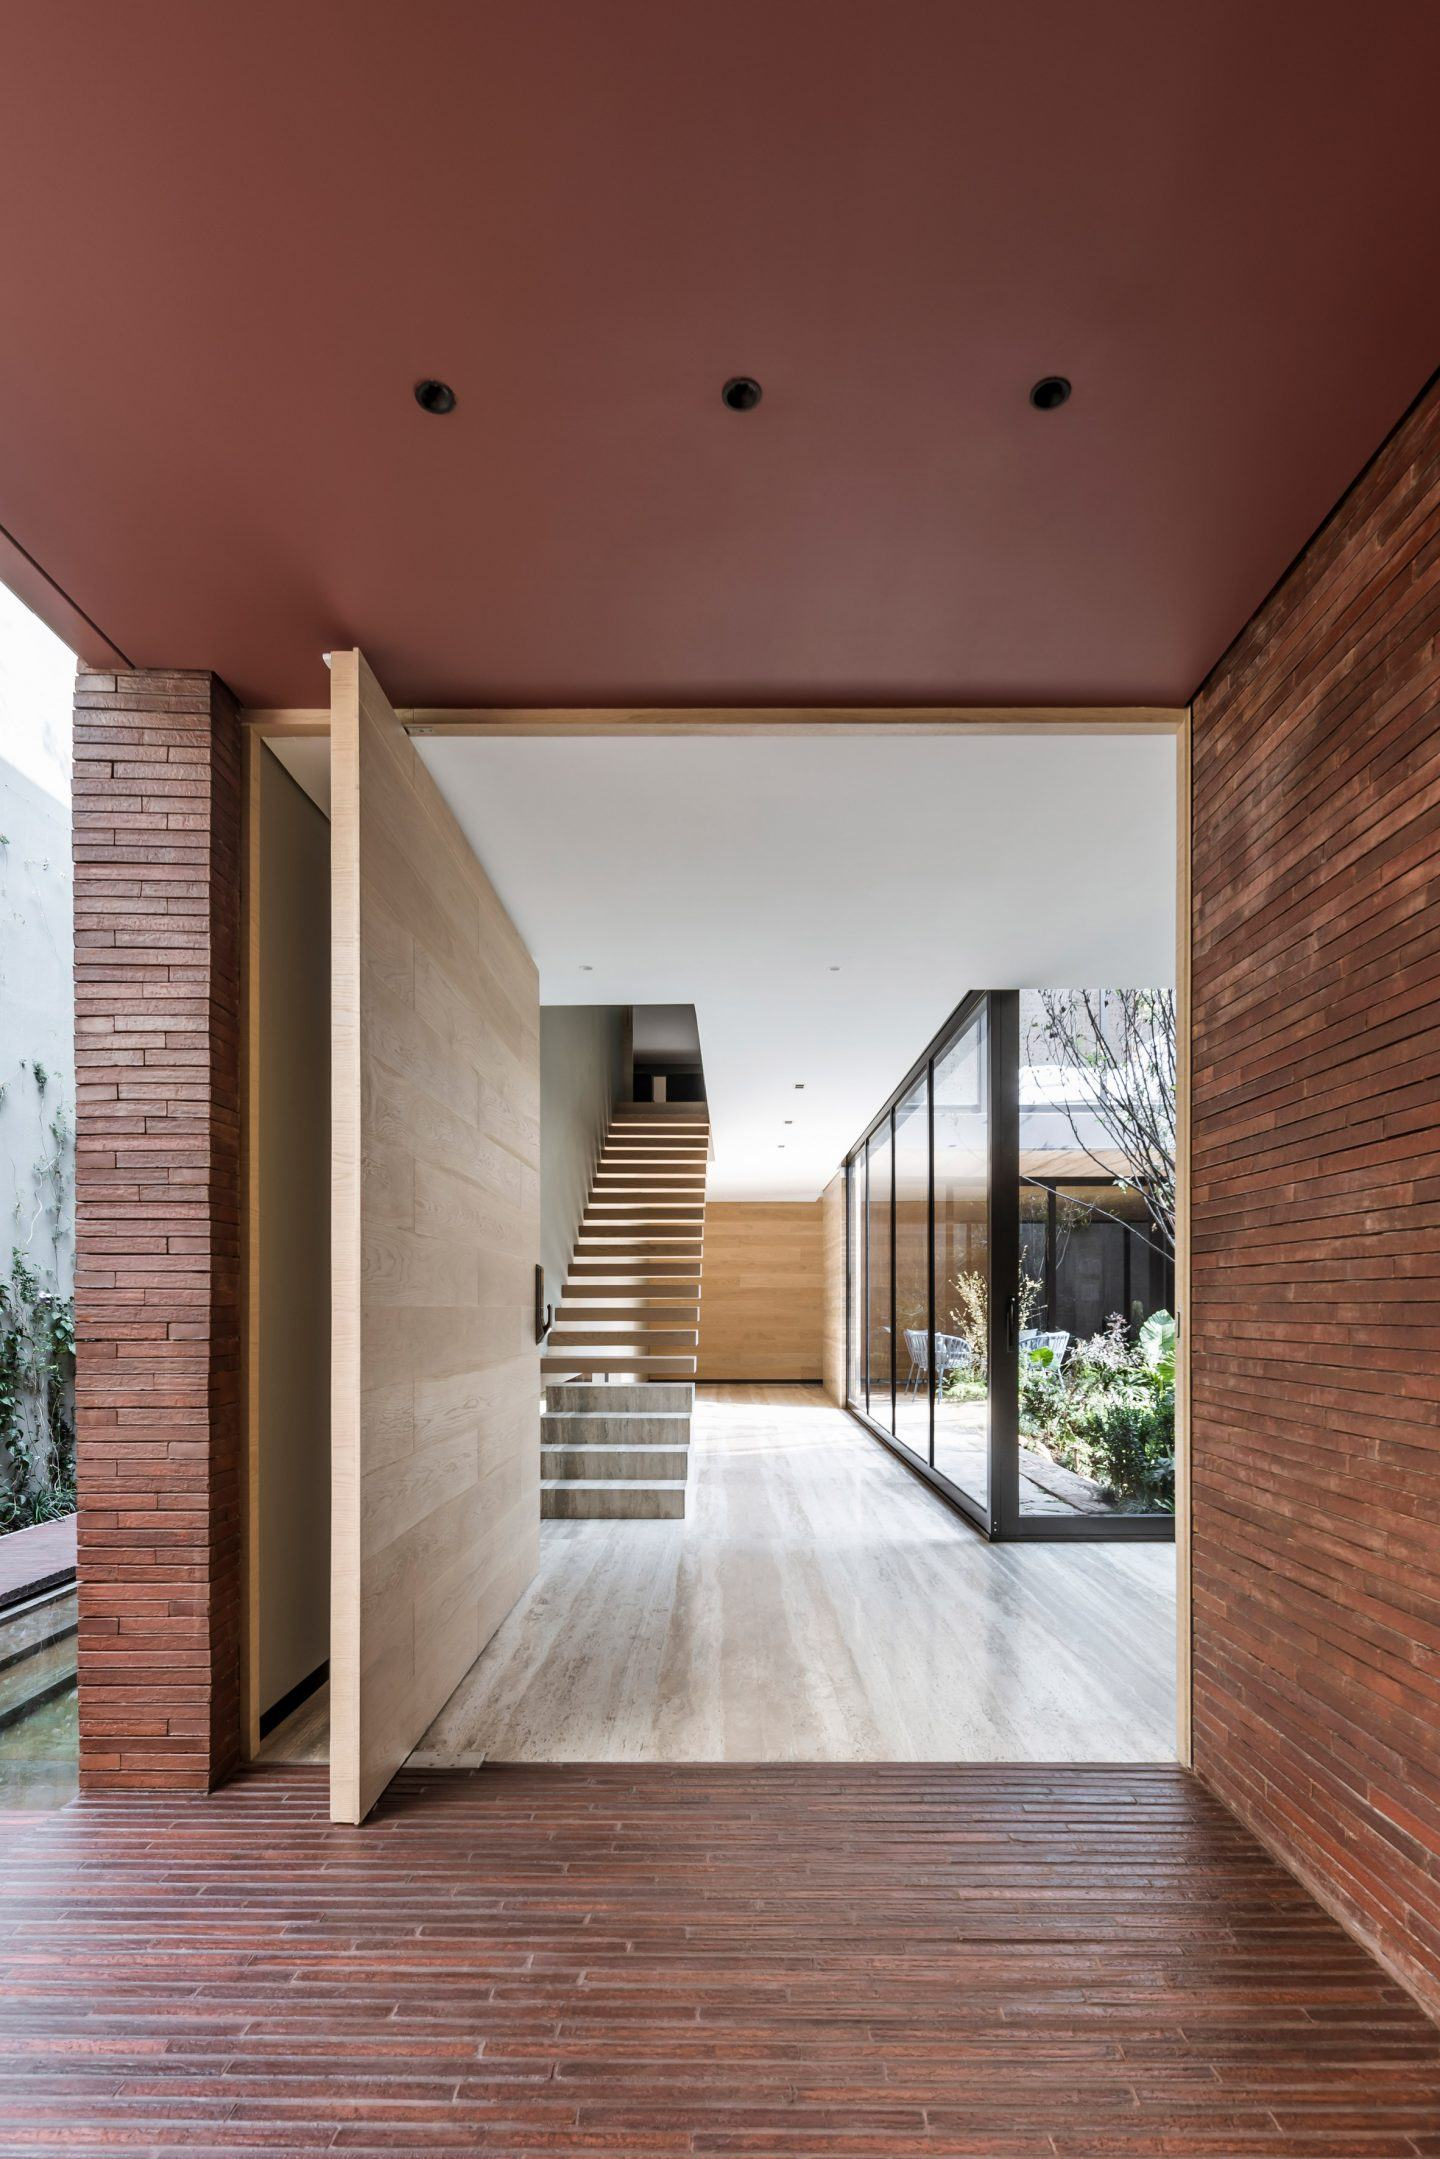 IGNANT-Architecture-Esrawe-Studio-Casa-Sierra-Fría-Cesar-Bejar-03